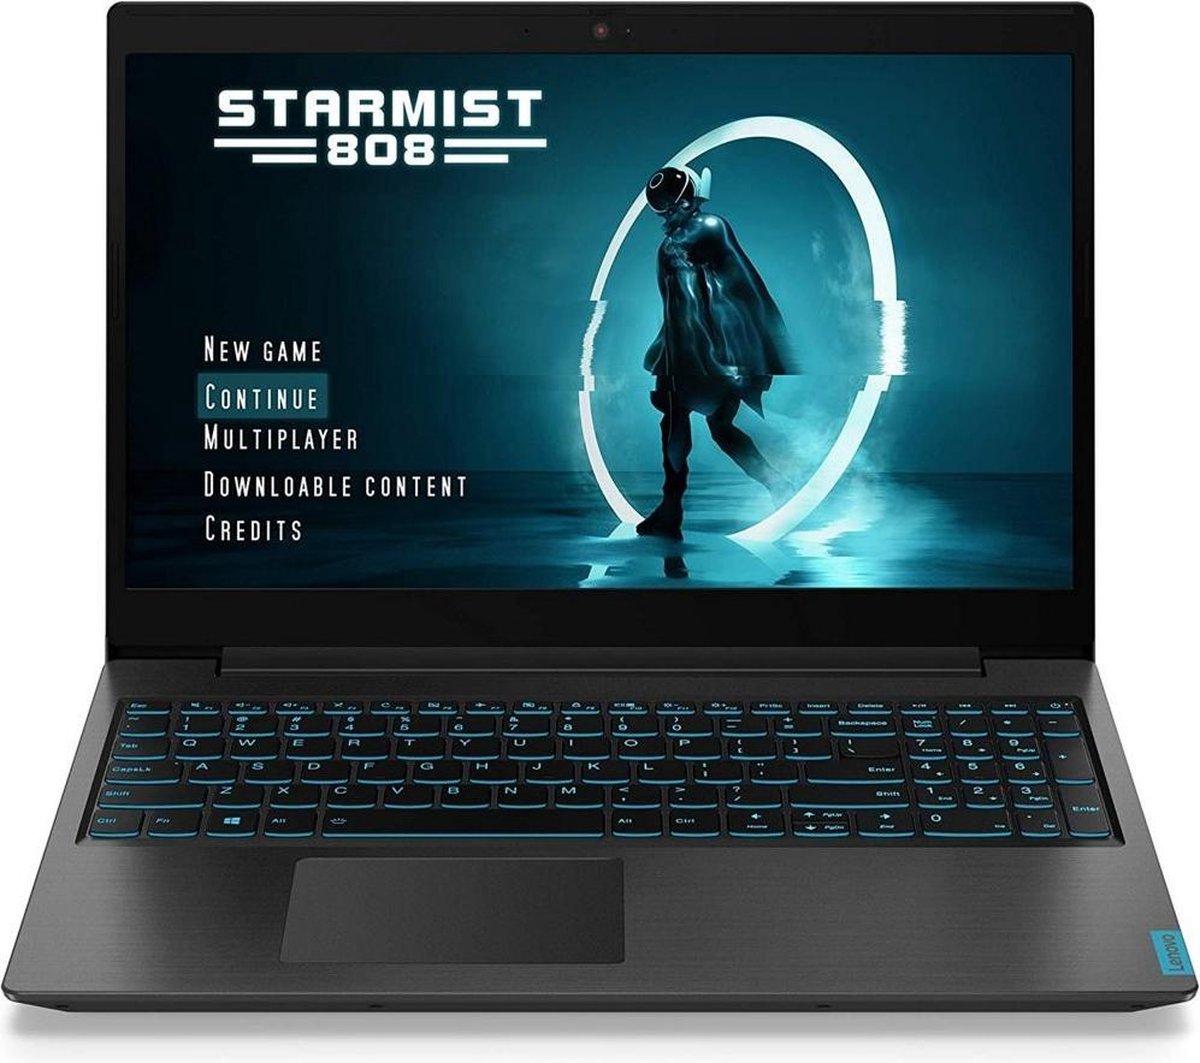 Lenovo Ideapad L340-15IRH Gaming (81LK01P9PB) 15.6 Full HD IPS / i5-9300HF / 16GB DDR4 / 512GB M.2 SSD / NVIDIA Geforce GTX1650 4GB / Windows 10 Pro